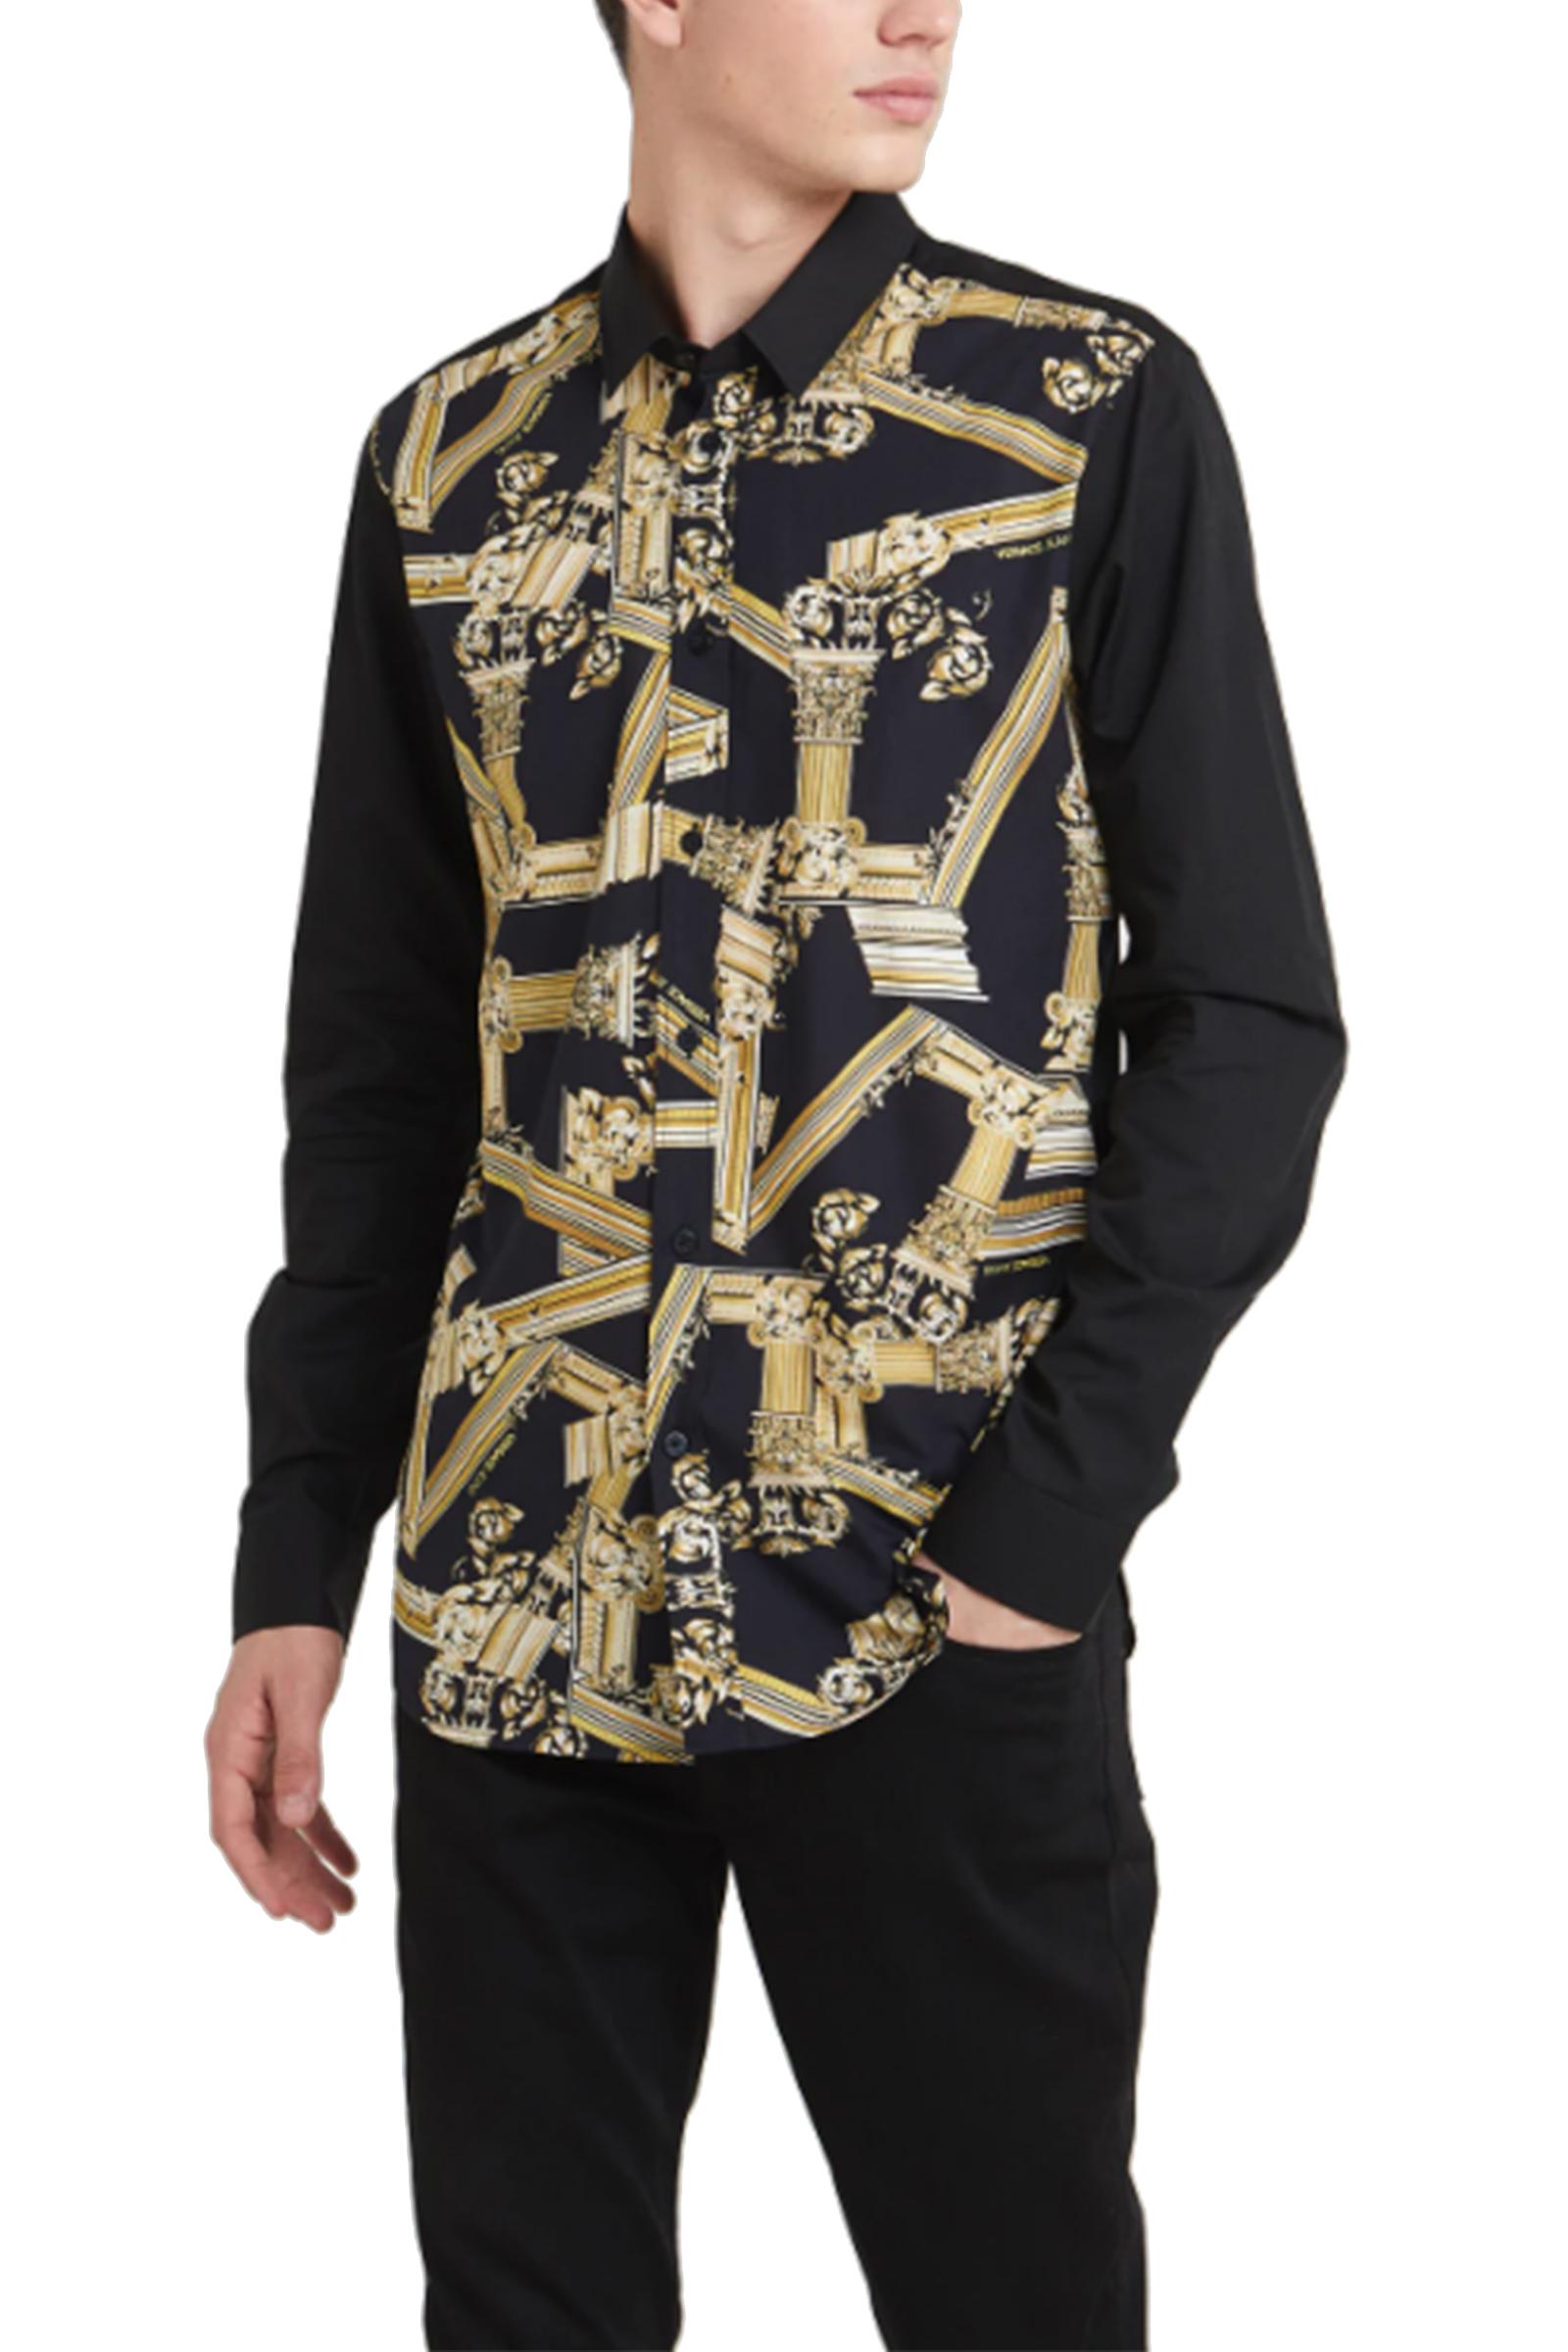 diversamente b73f3 bc823 Camicia Versace Jeans Nera Santangelostore Uomo tQrdCxsh